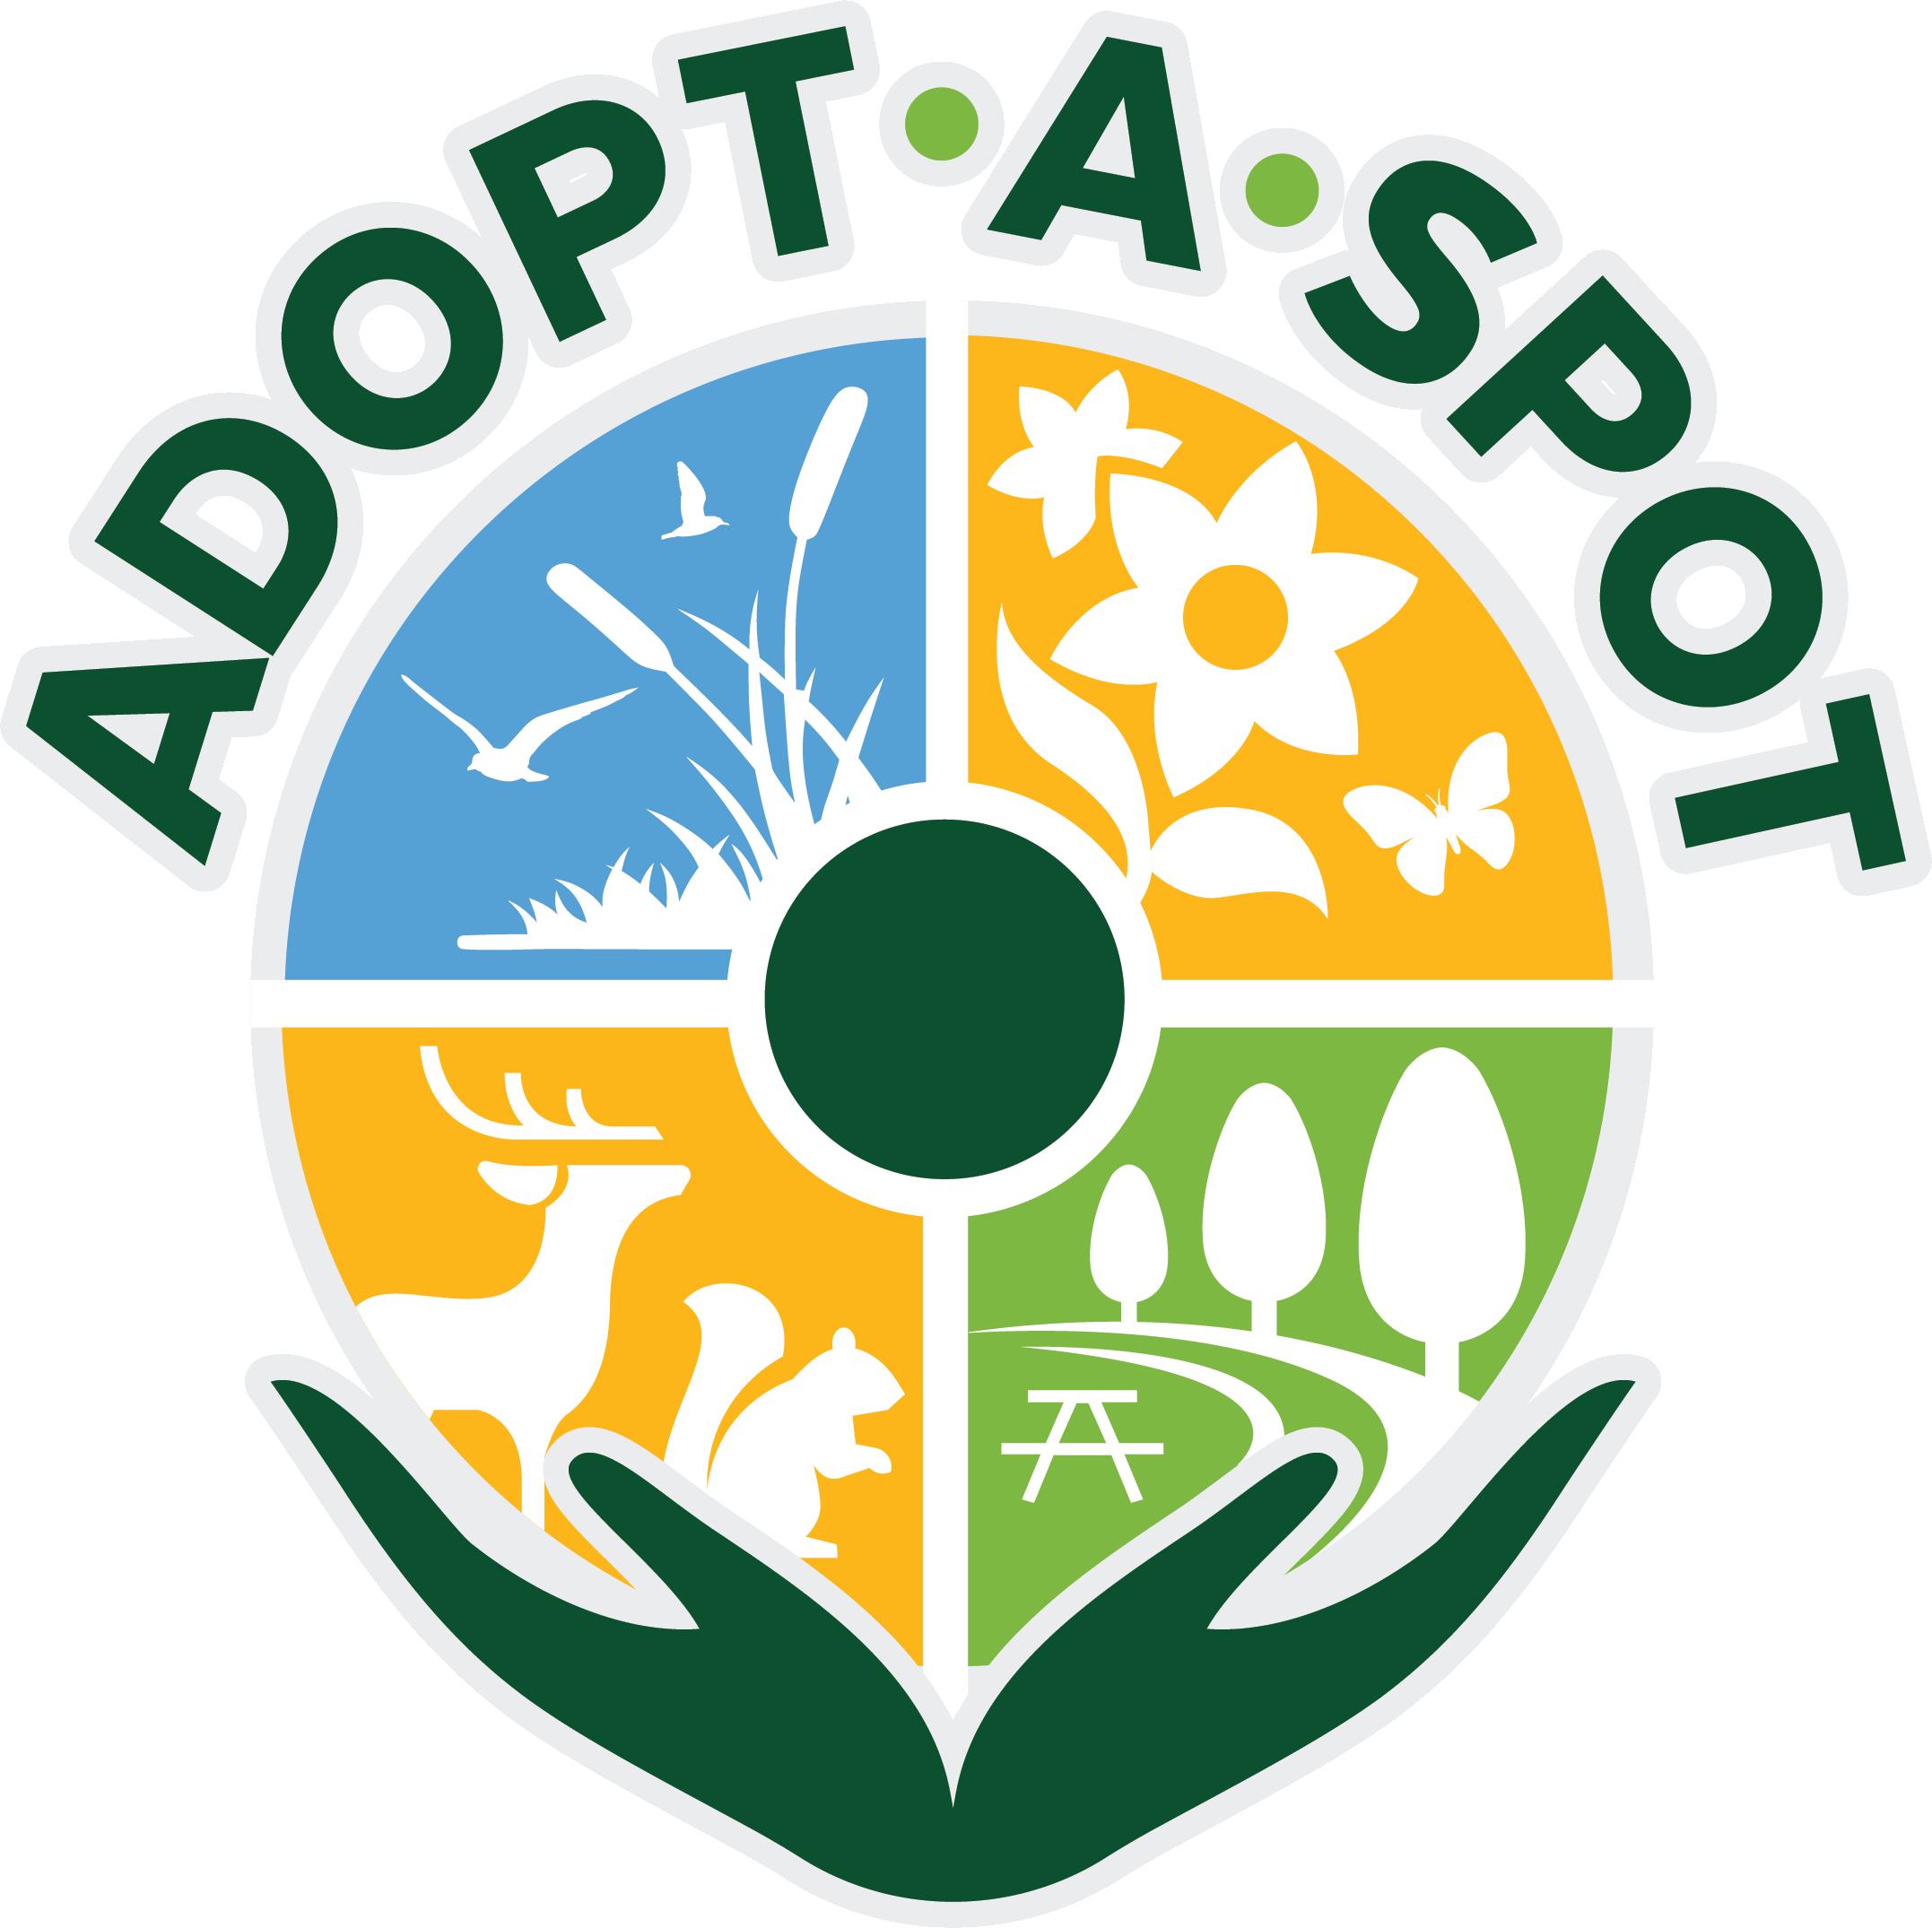 Volunteering clipart recreation center. Adopt a spot program